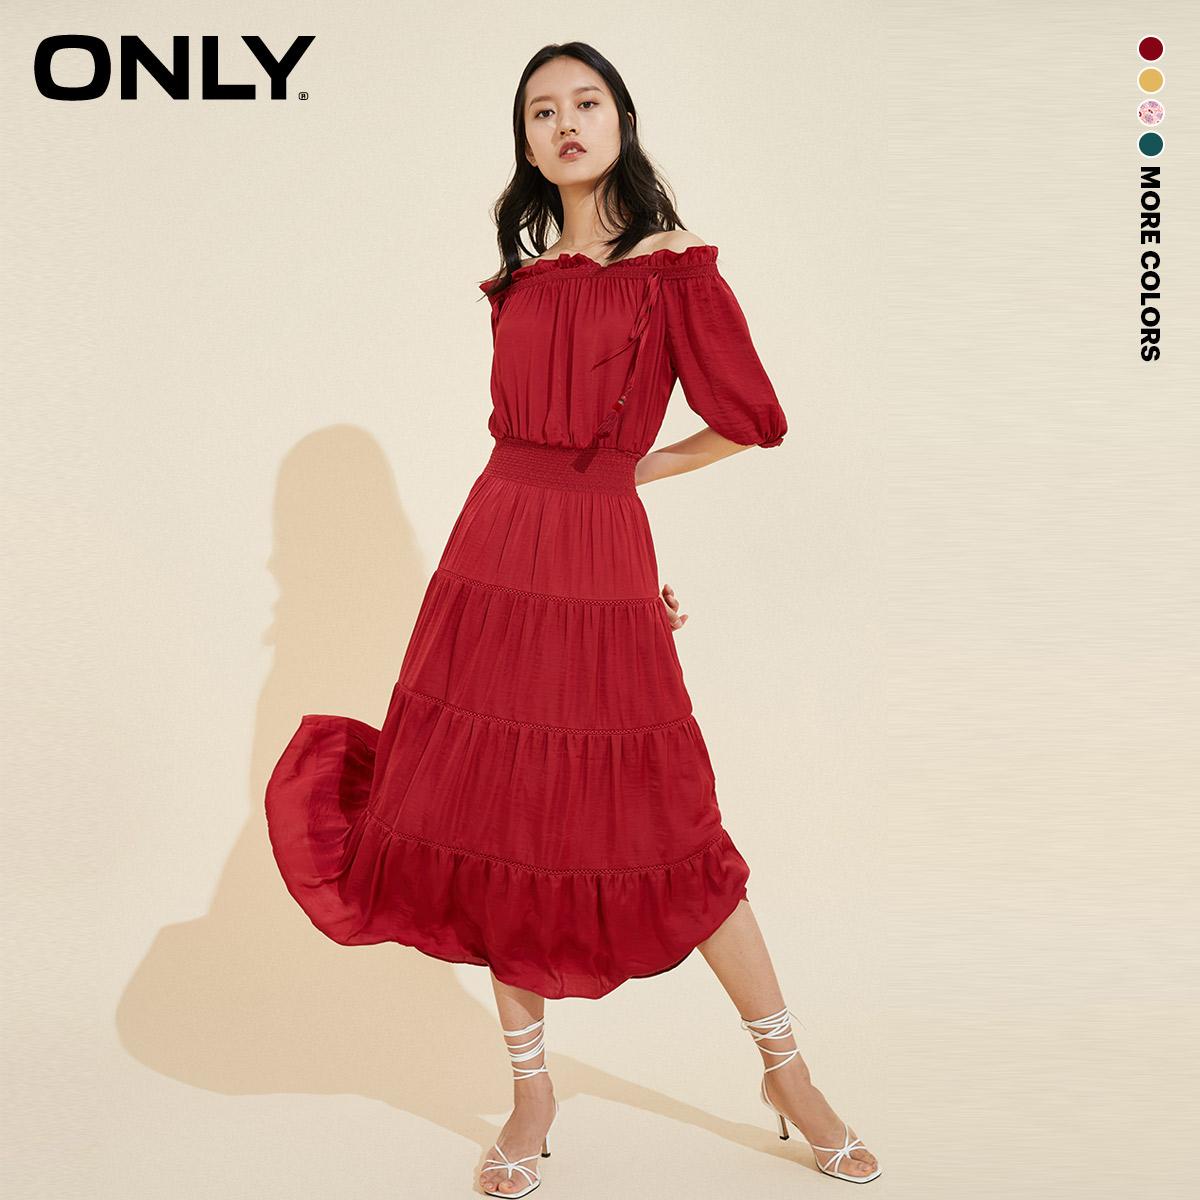 ONLY夏季新款收腰显瘦一字肩长款雪纺连衣裙女|120207530